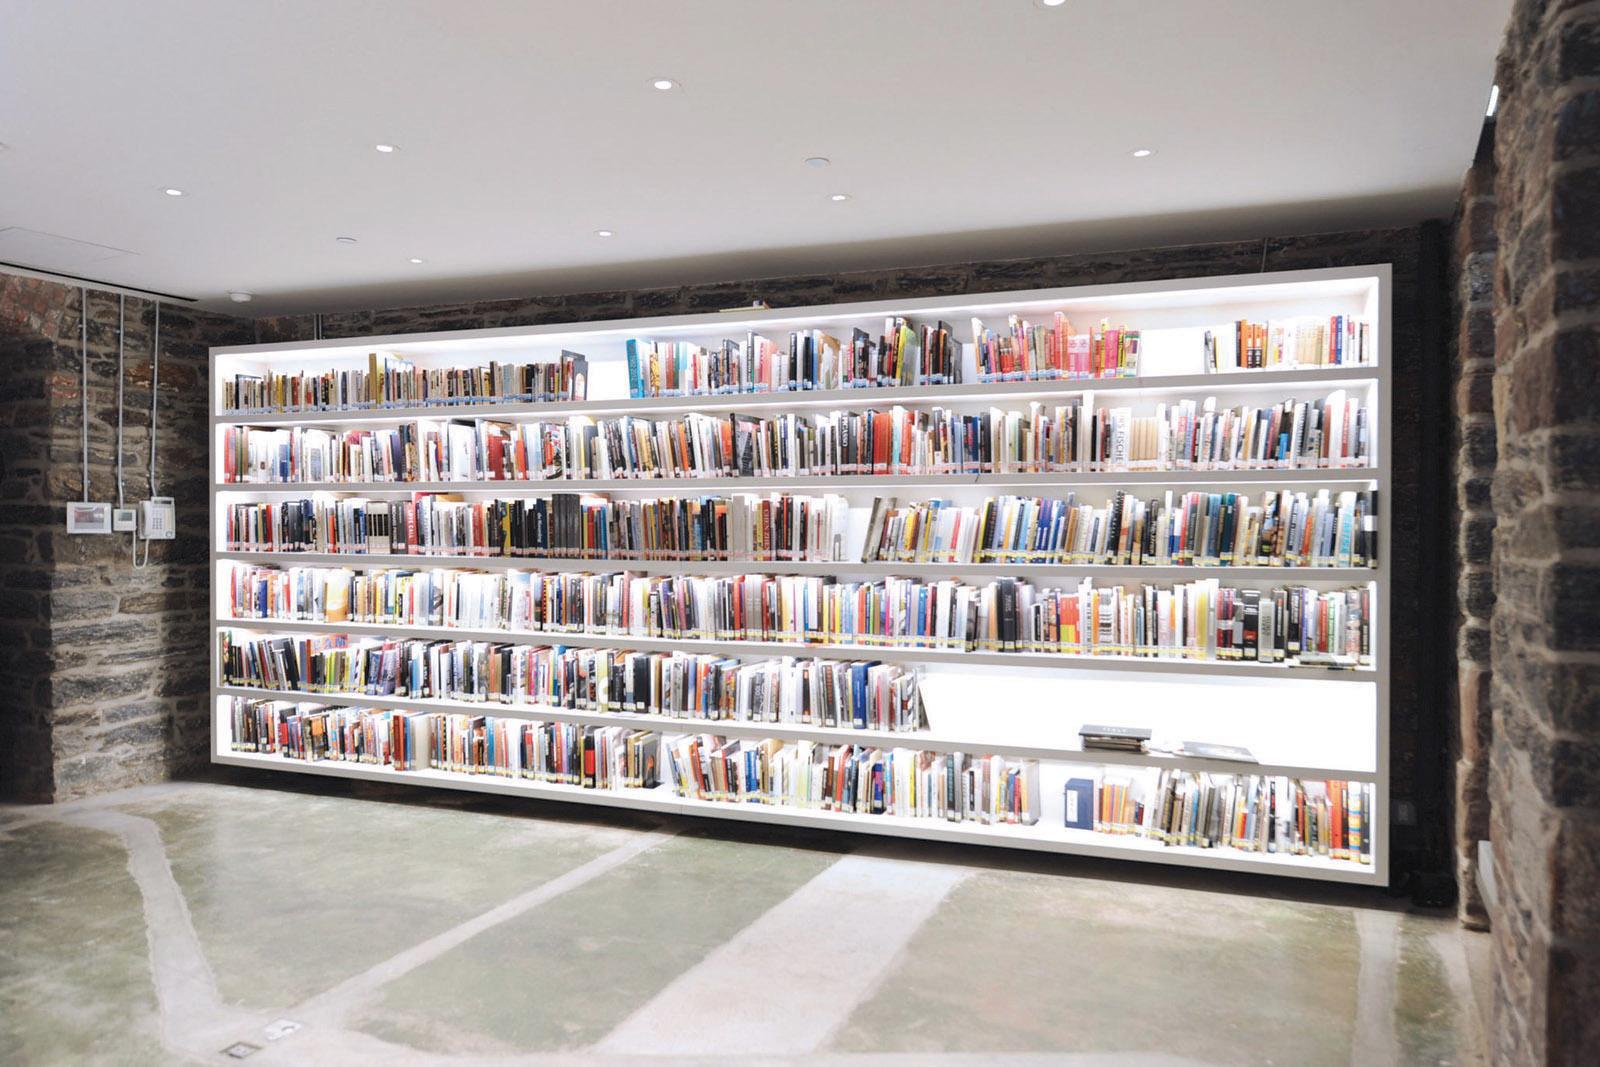 07-Cai Guo Qiang Studio-library.jpg